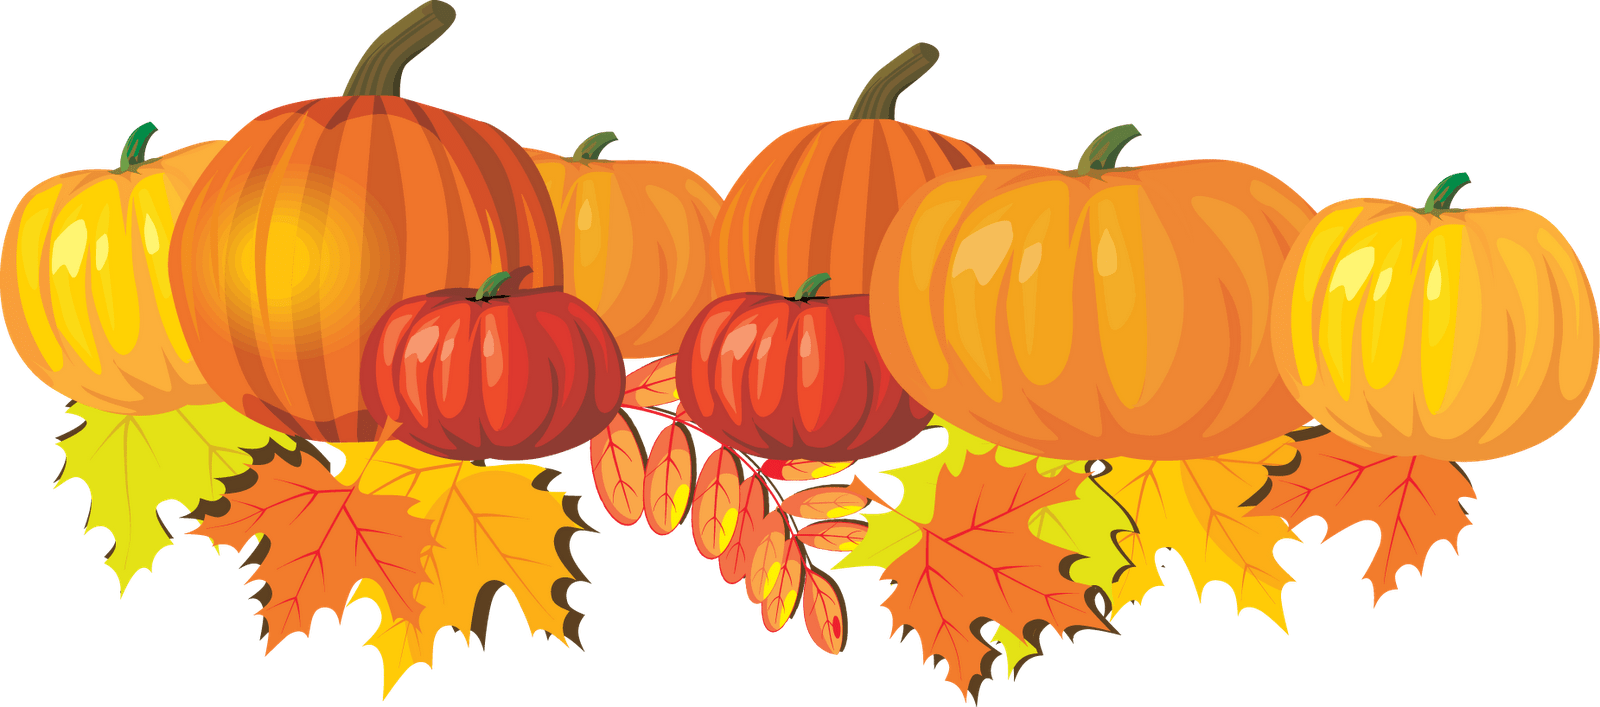 Preschool fall clipart pumpkin banner free download fall-pumpkins-and-leaves - Sacred Heart School banner free download